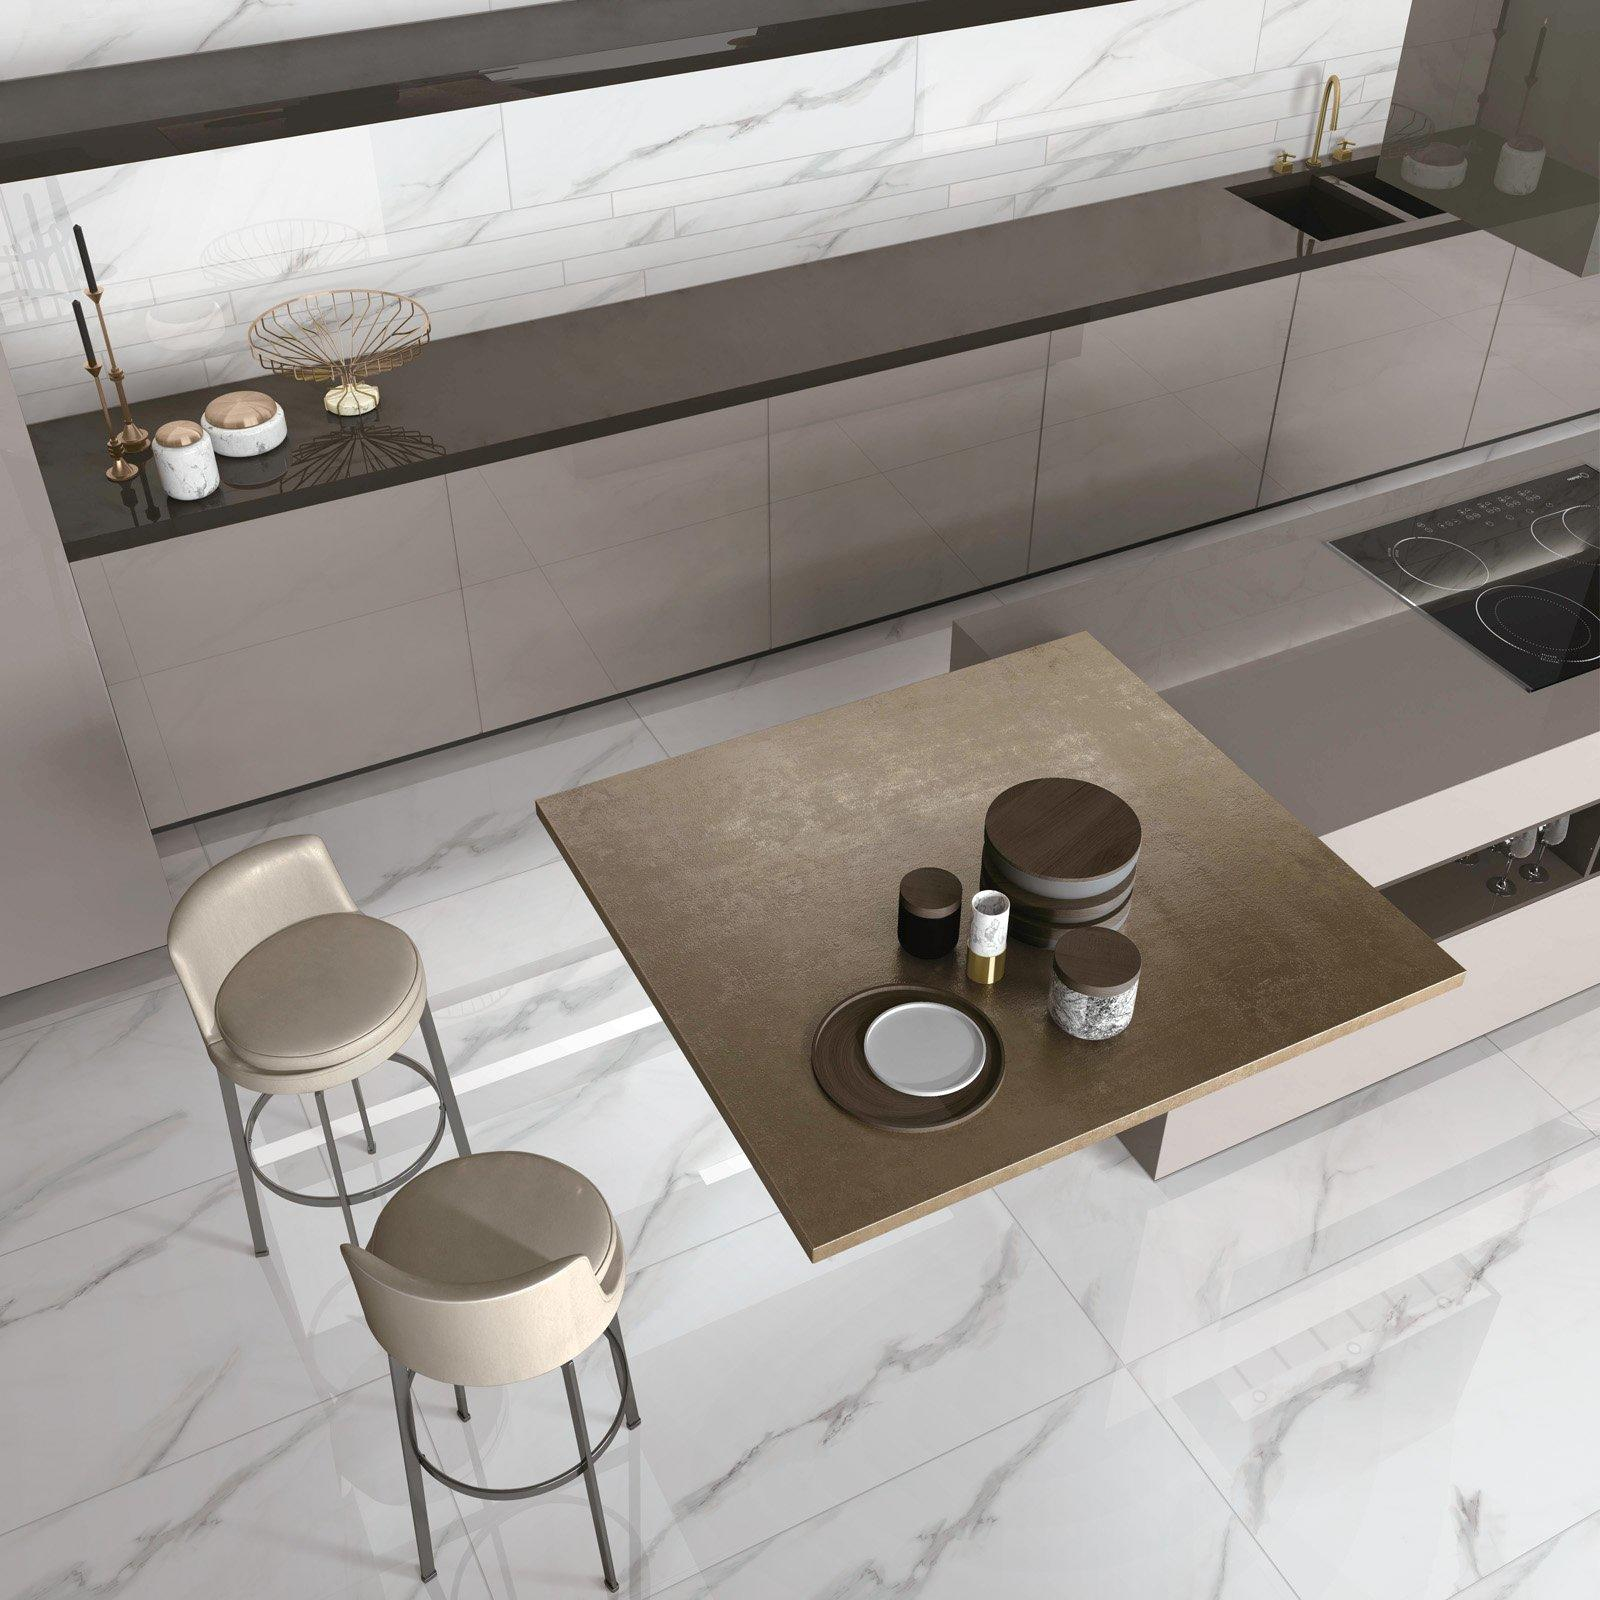 Carrara White Full body ceramic wall tiles VDLS1261314YJT  60x120cm/24x48'